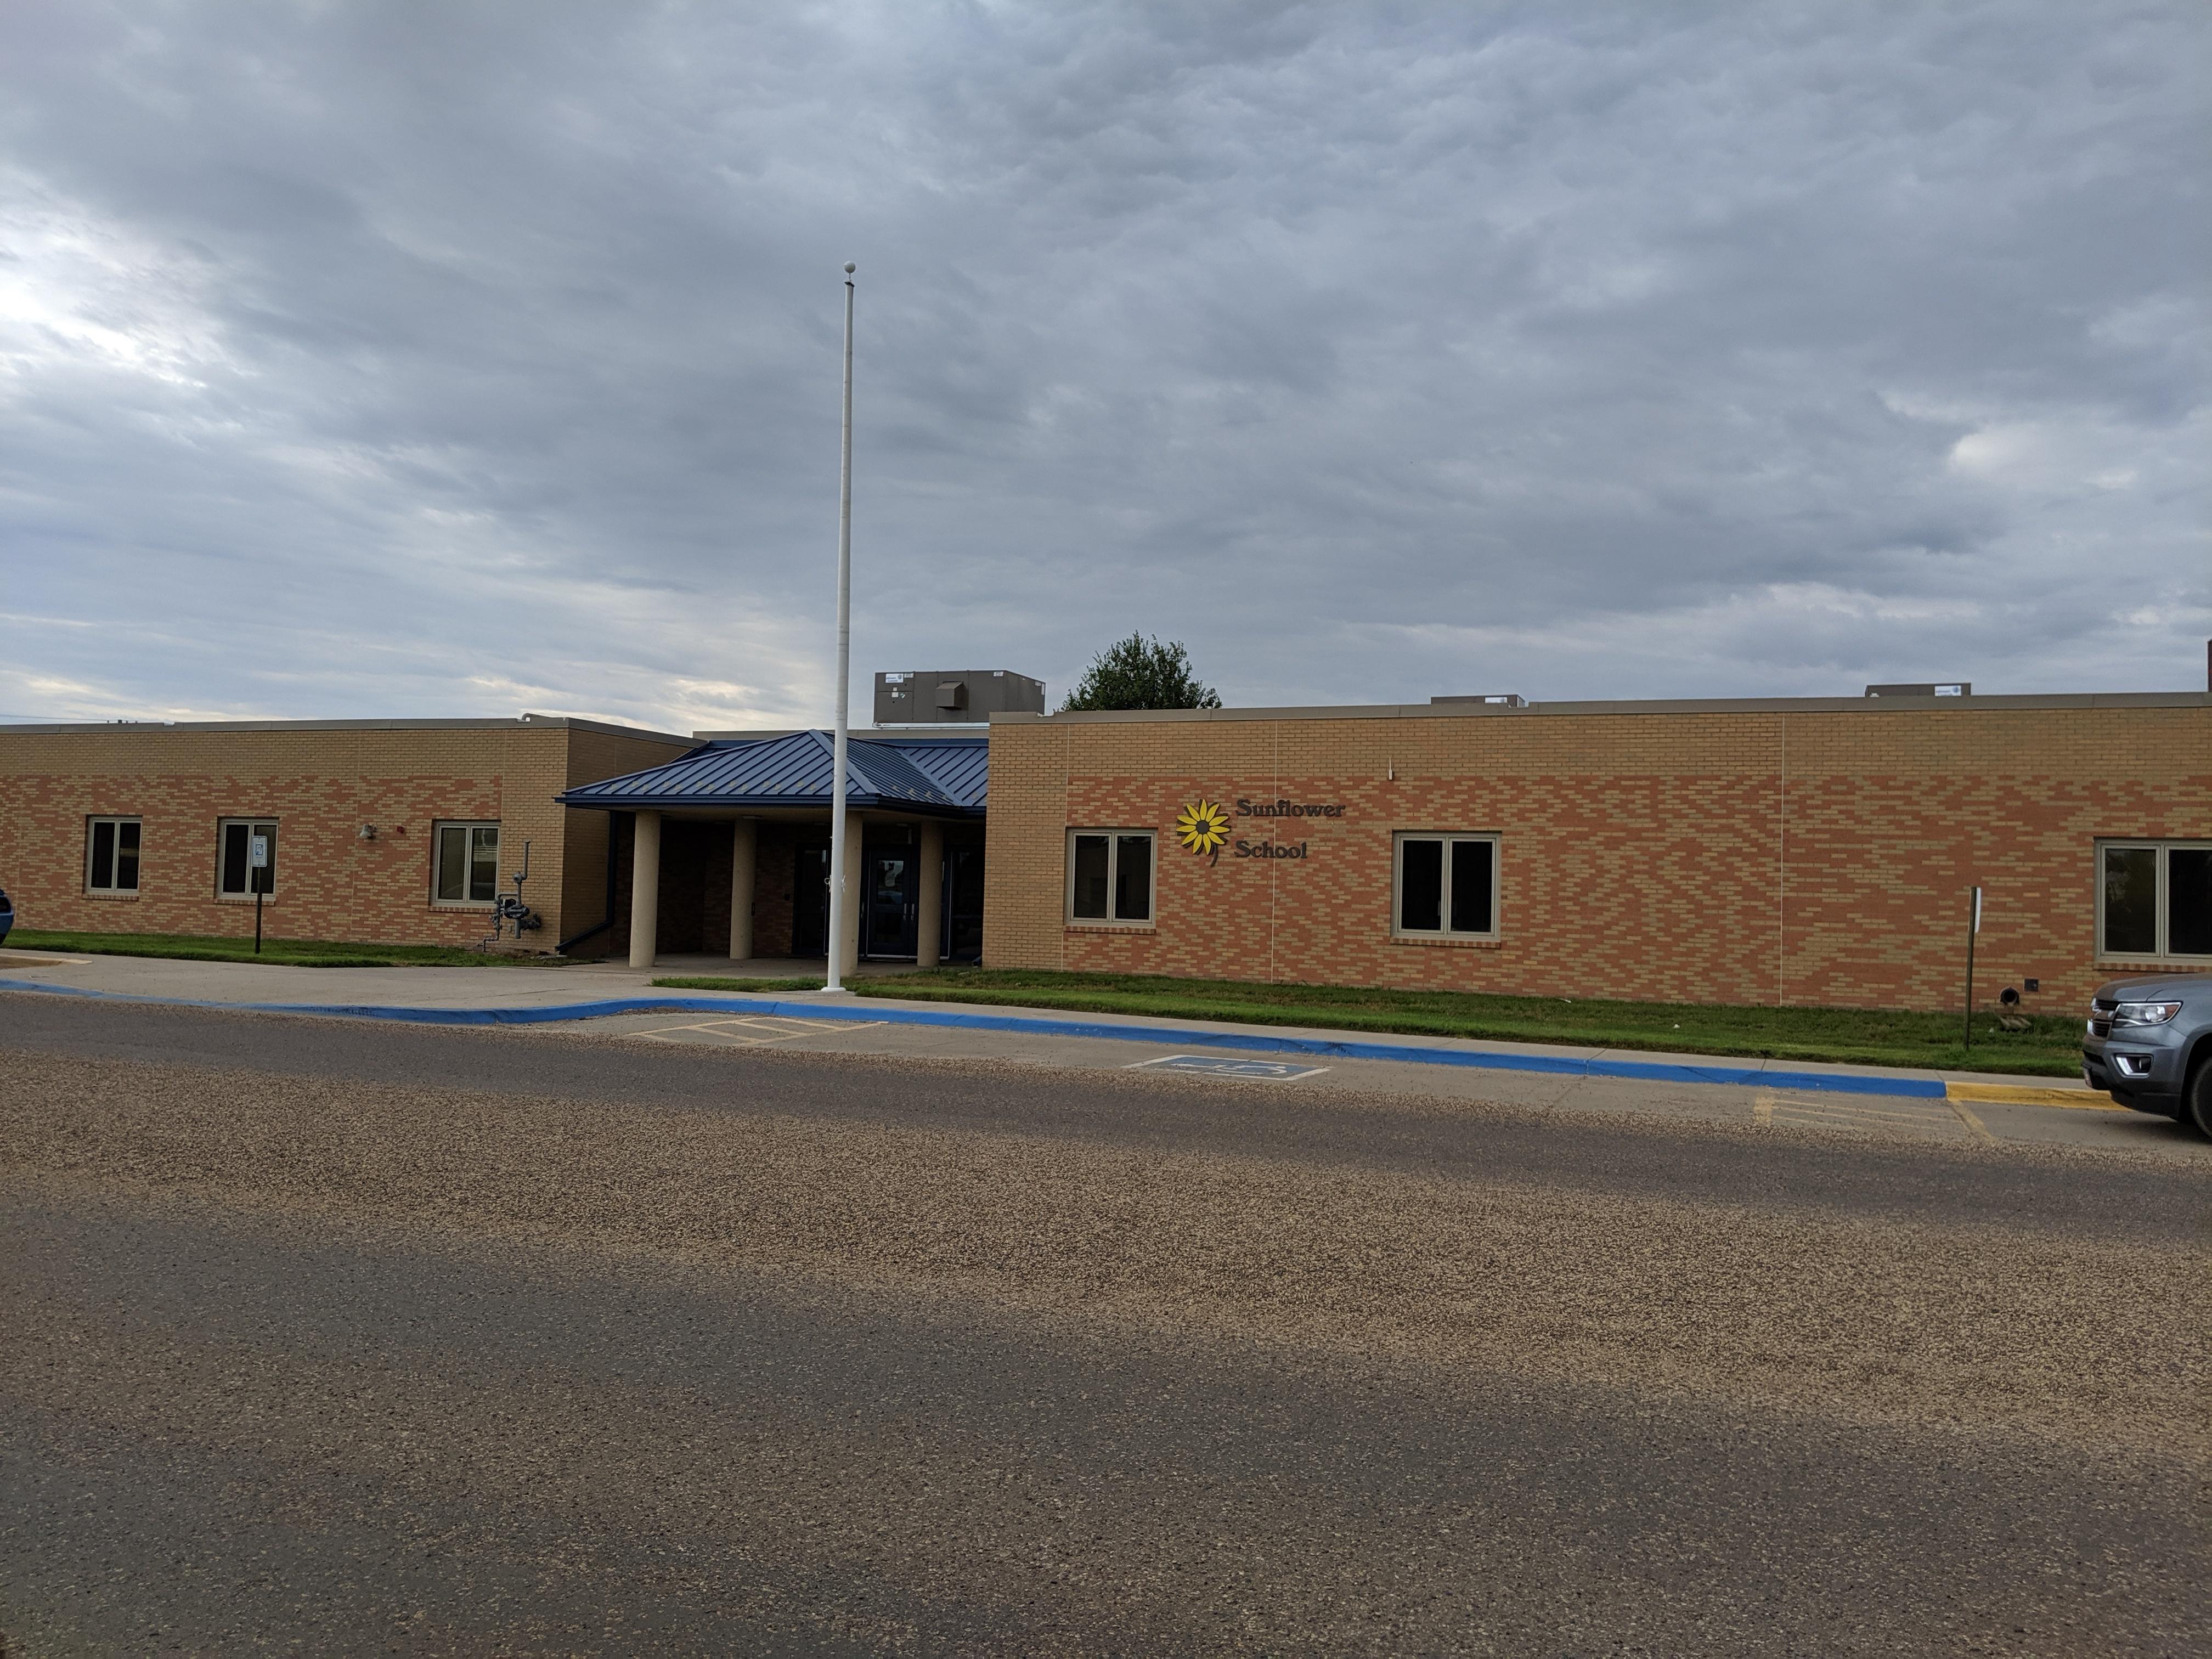 Sunflower School building